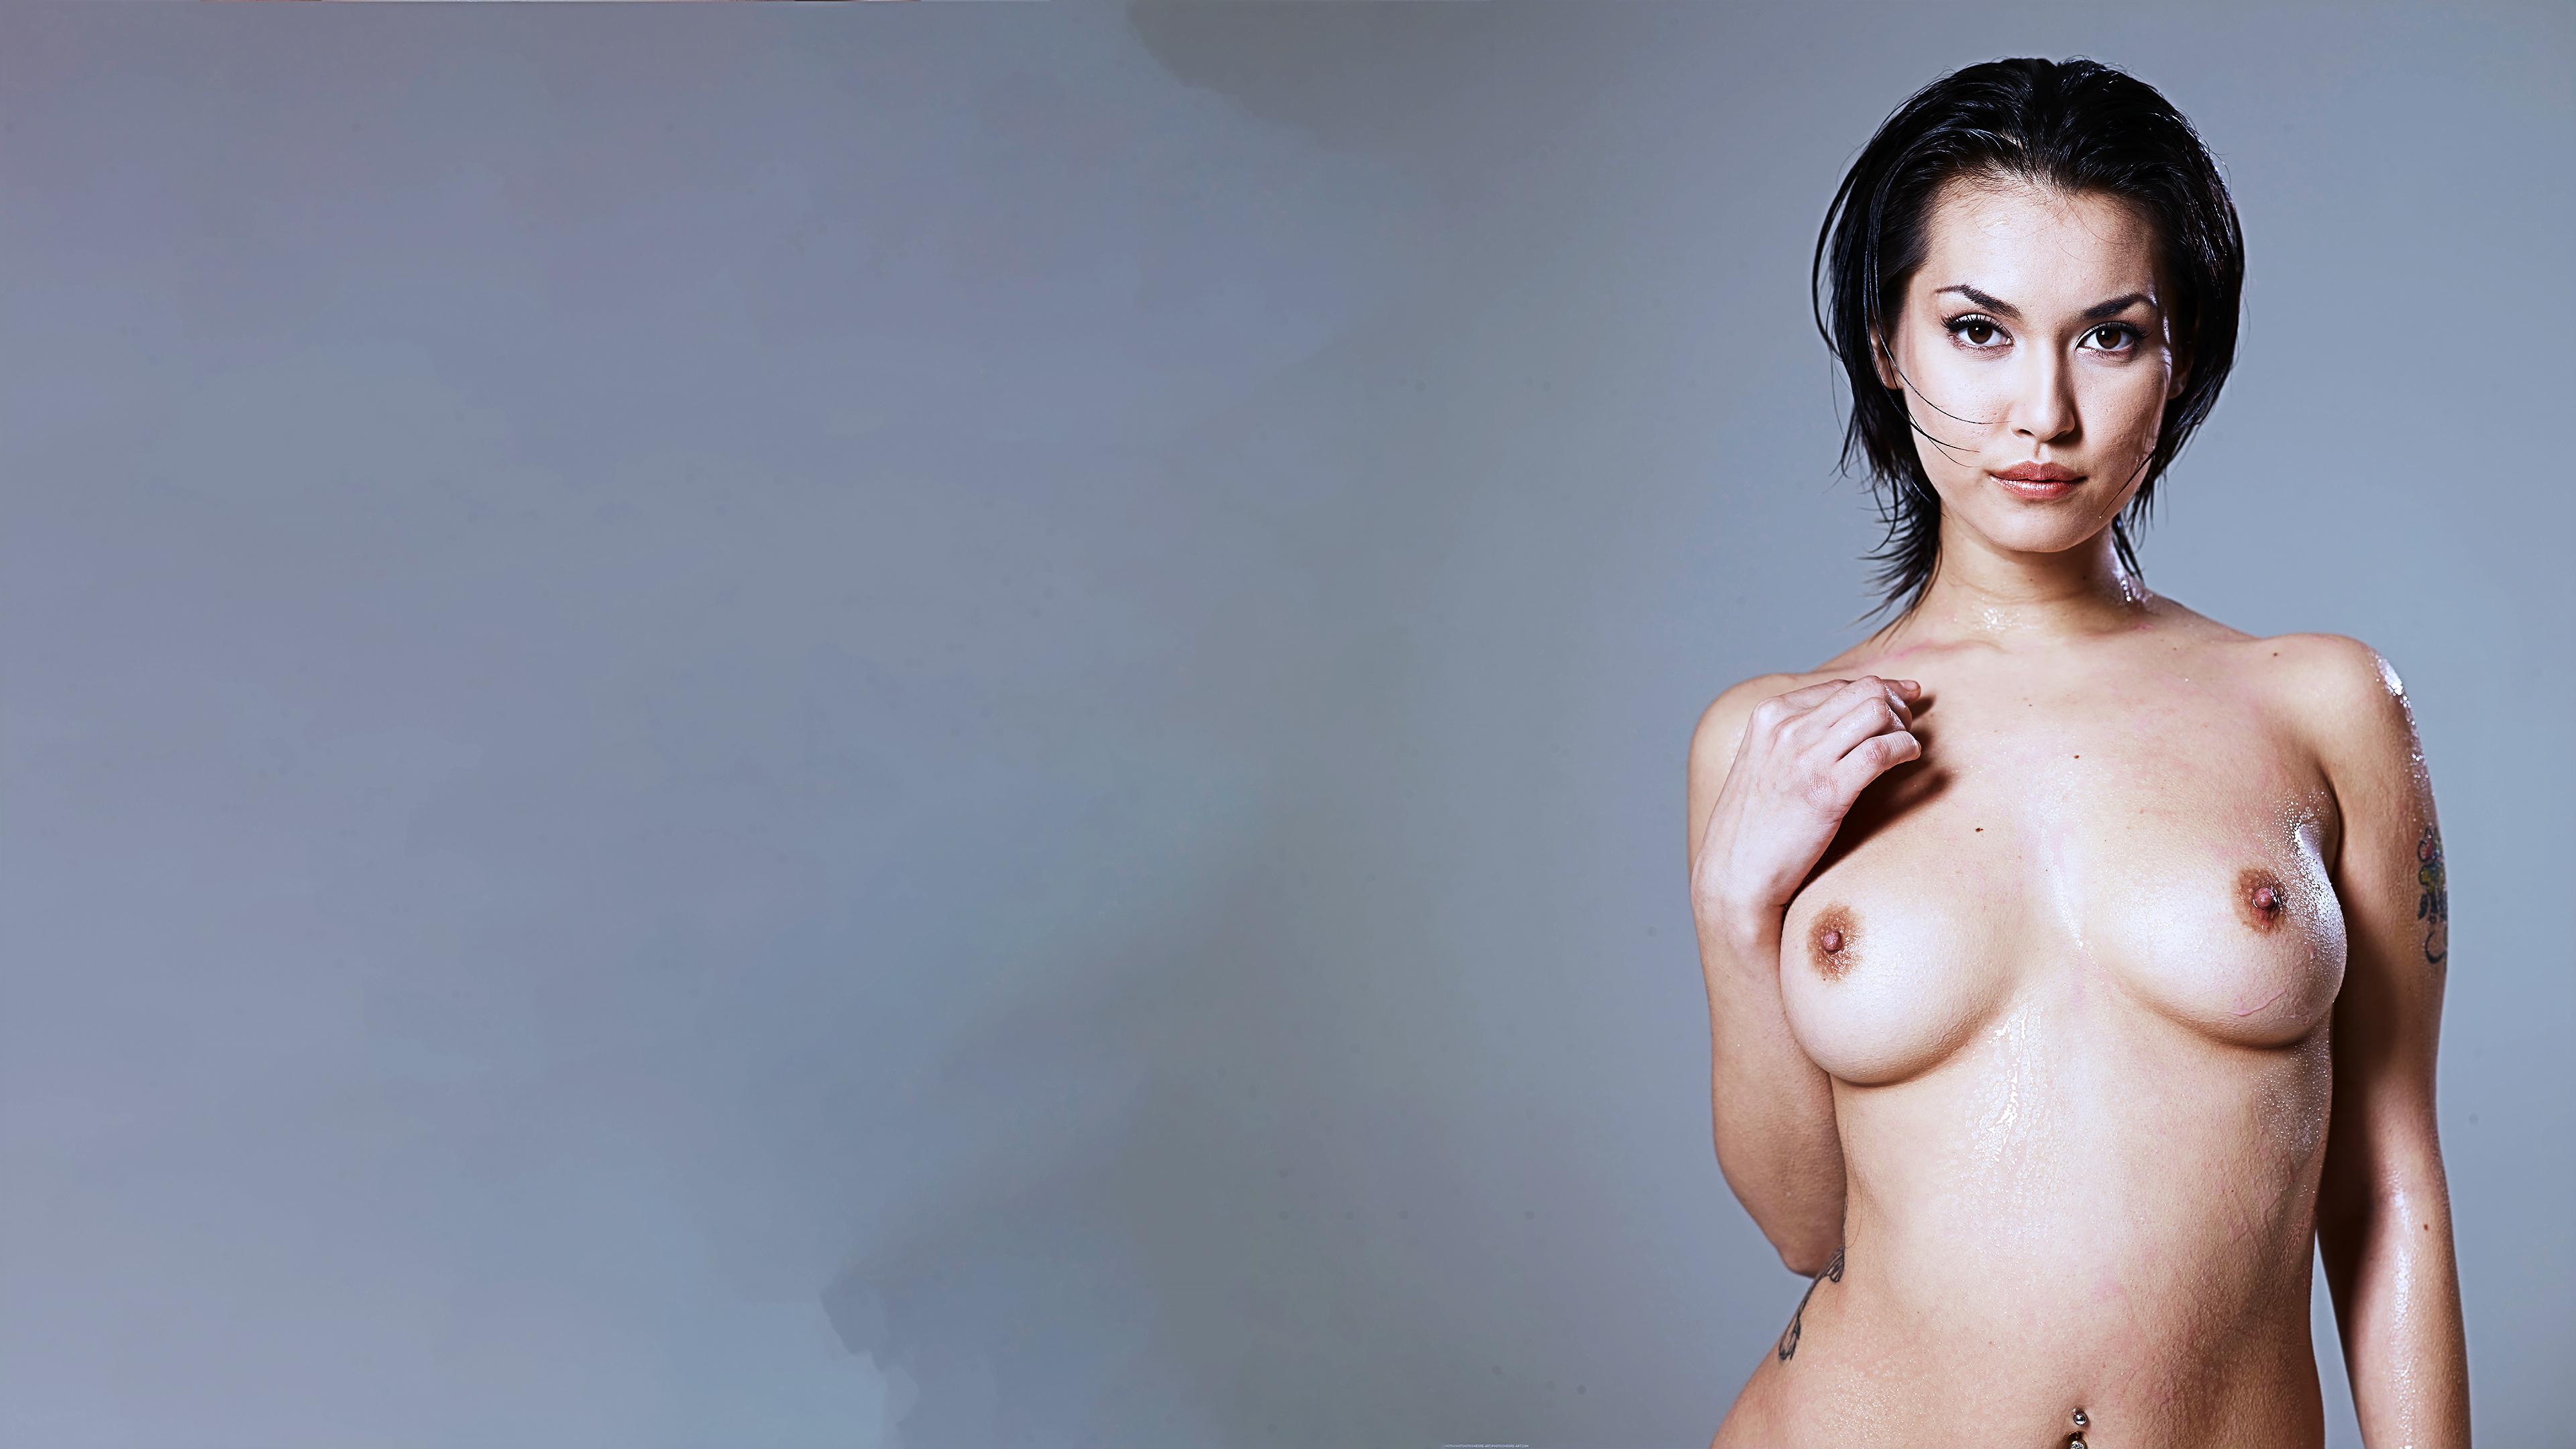 4k nude wallpaper